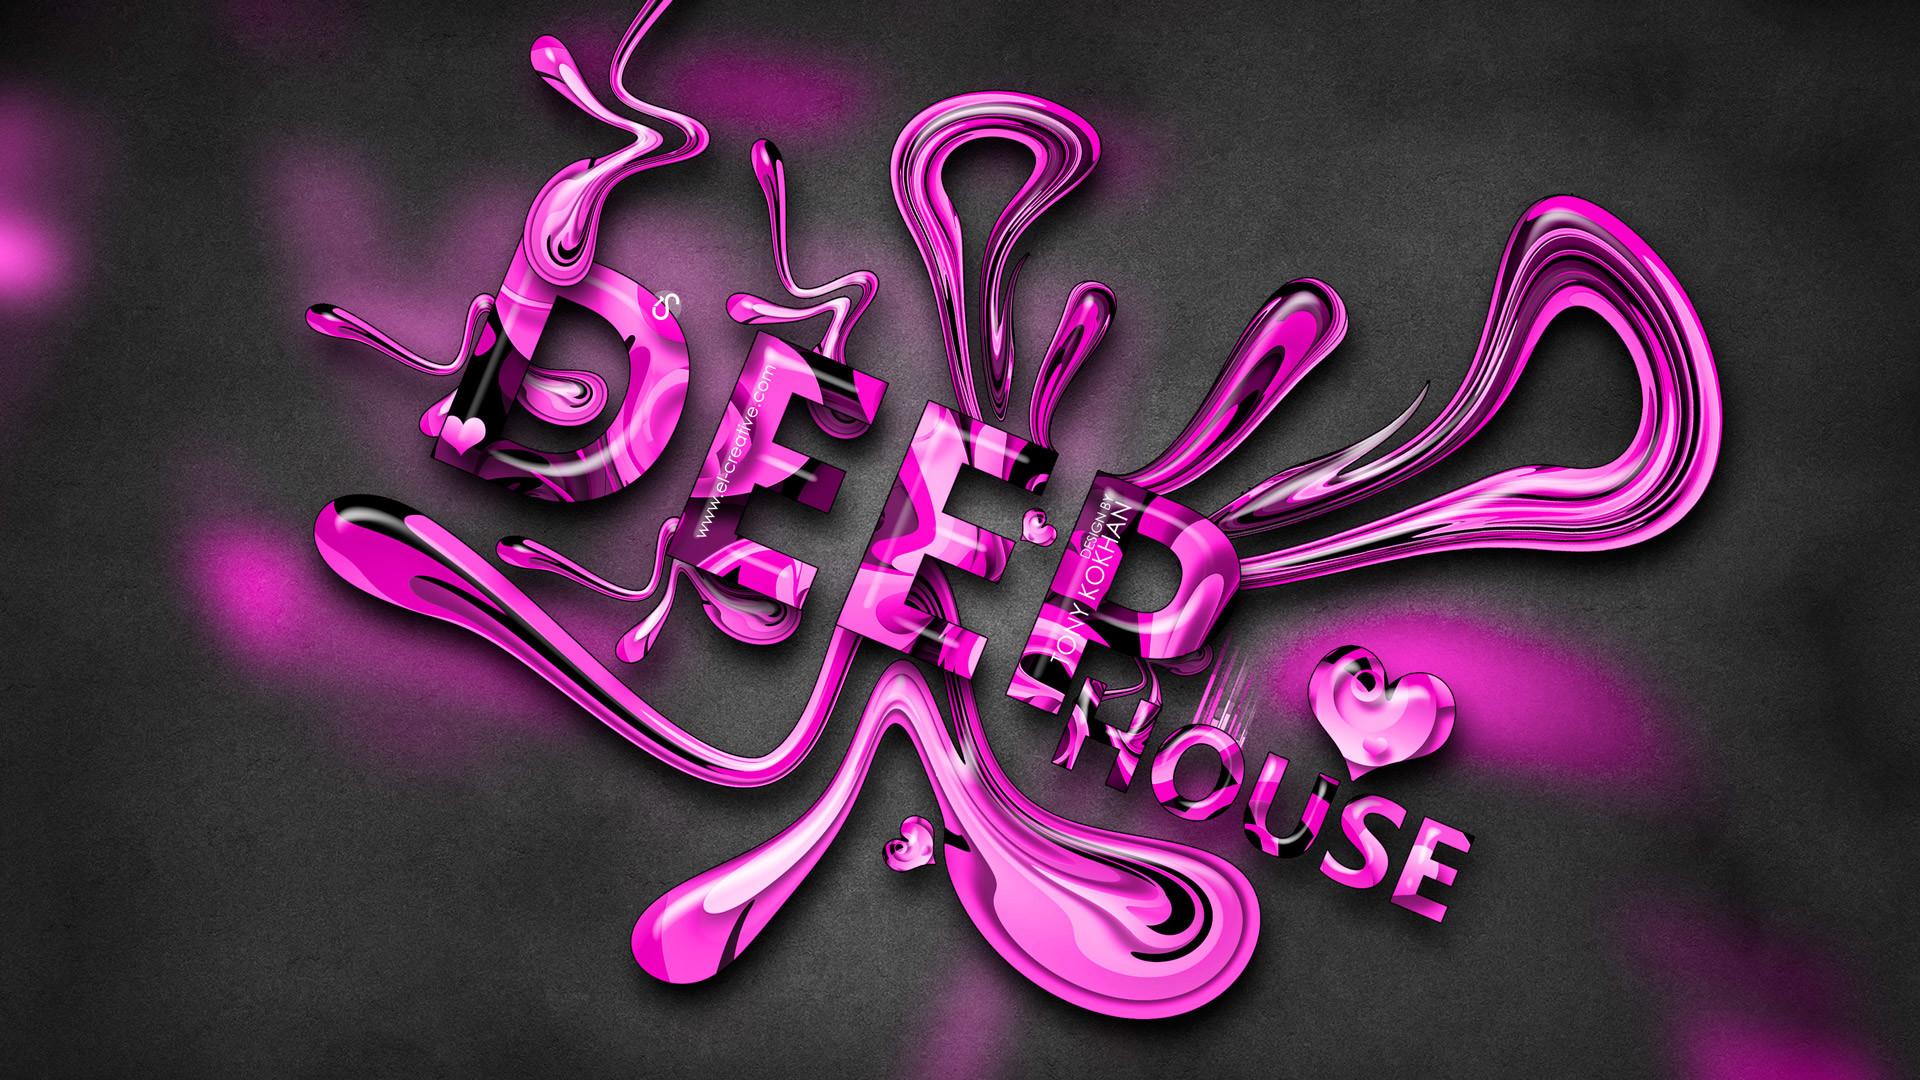 Dj aynes vonadhz deep house music 3 aynesvonadhz for Deep house 2000